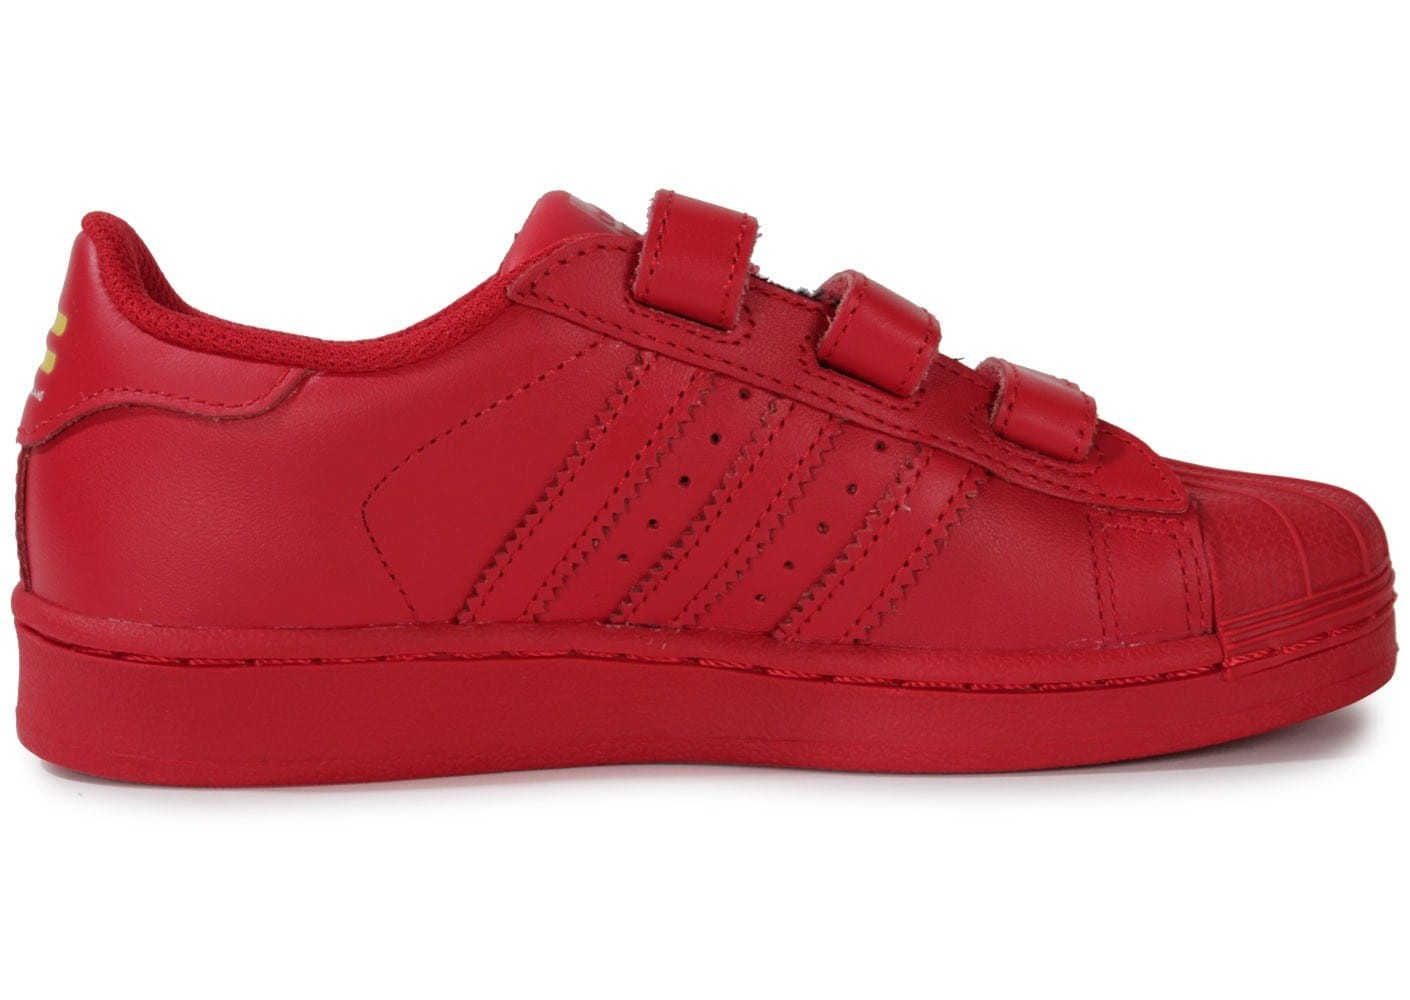 adidas superstars rouge femme original